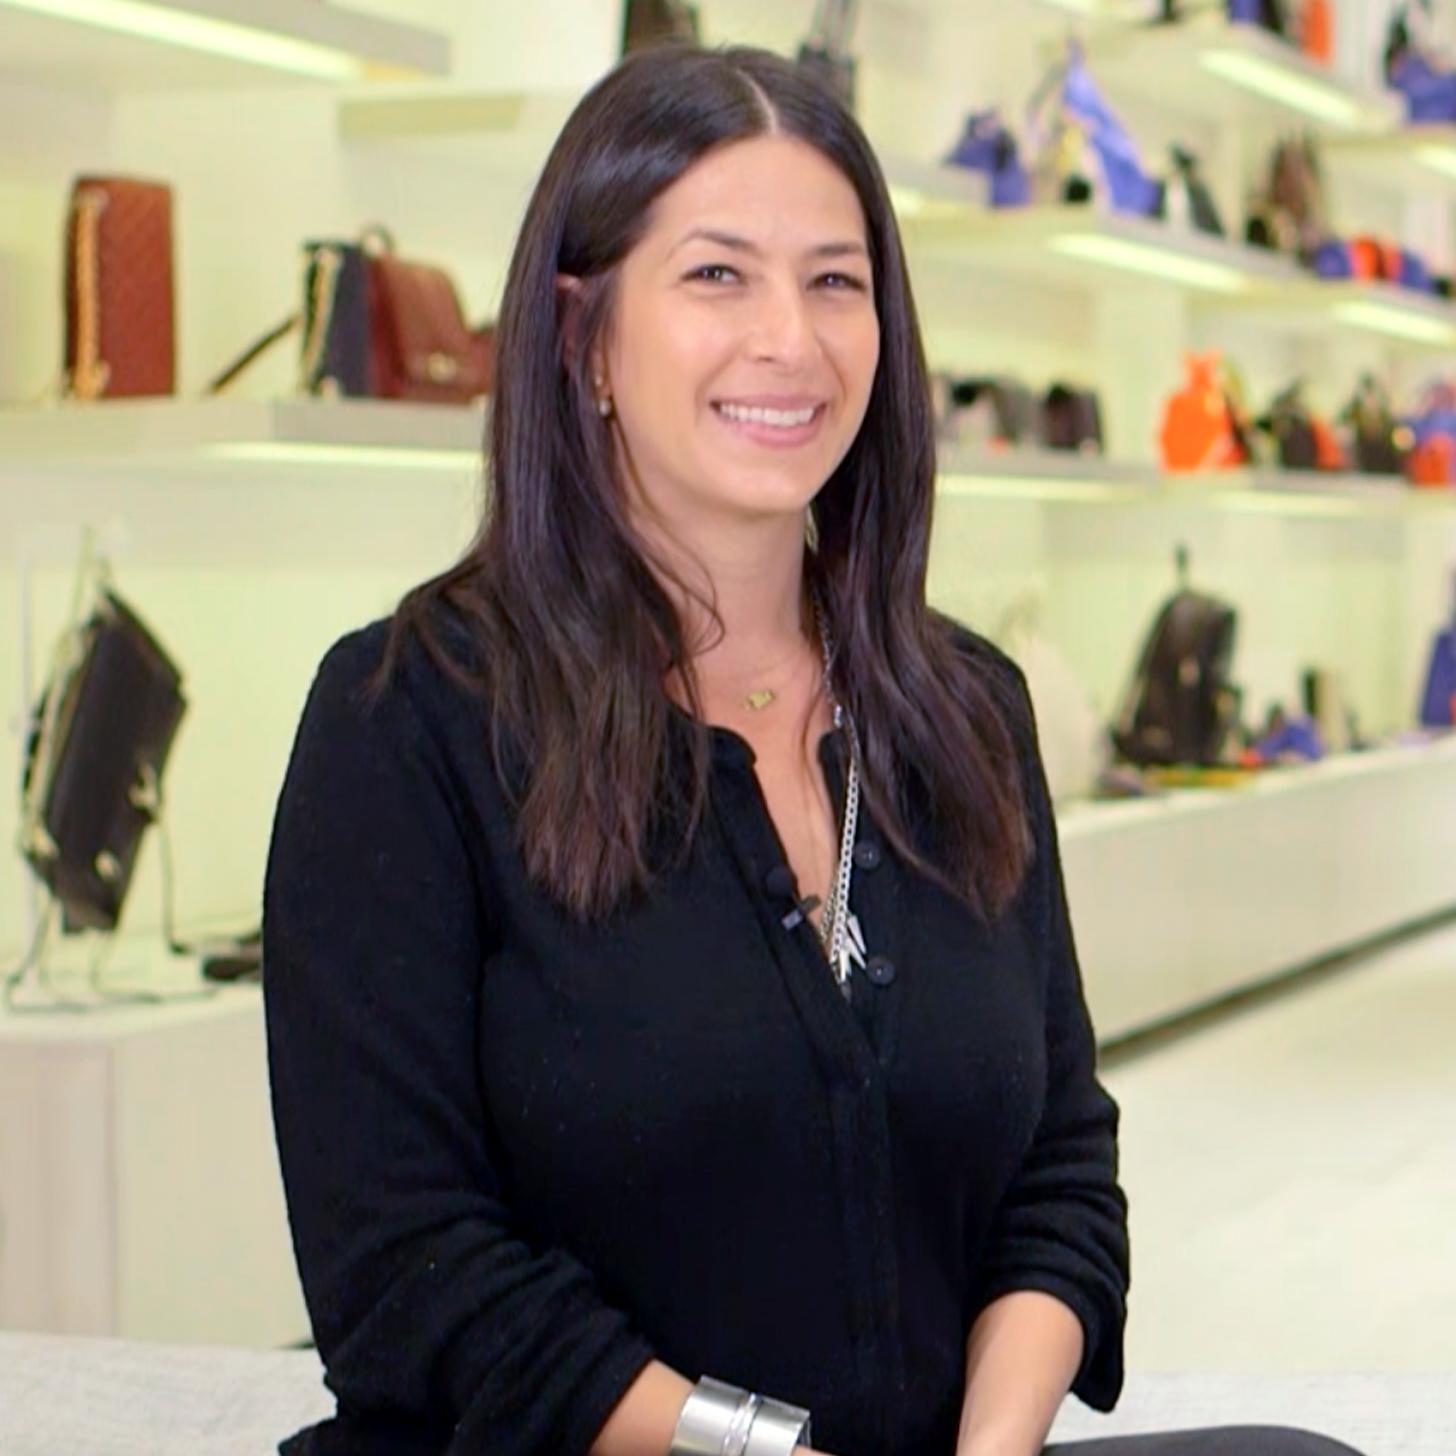 Rebecca Minkoff High-Tech New York Store Tour | POPSUGAR Fashion